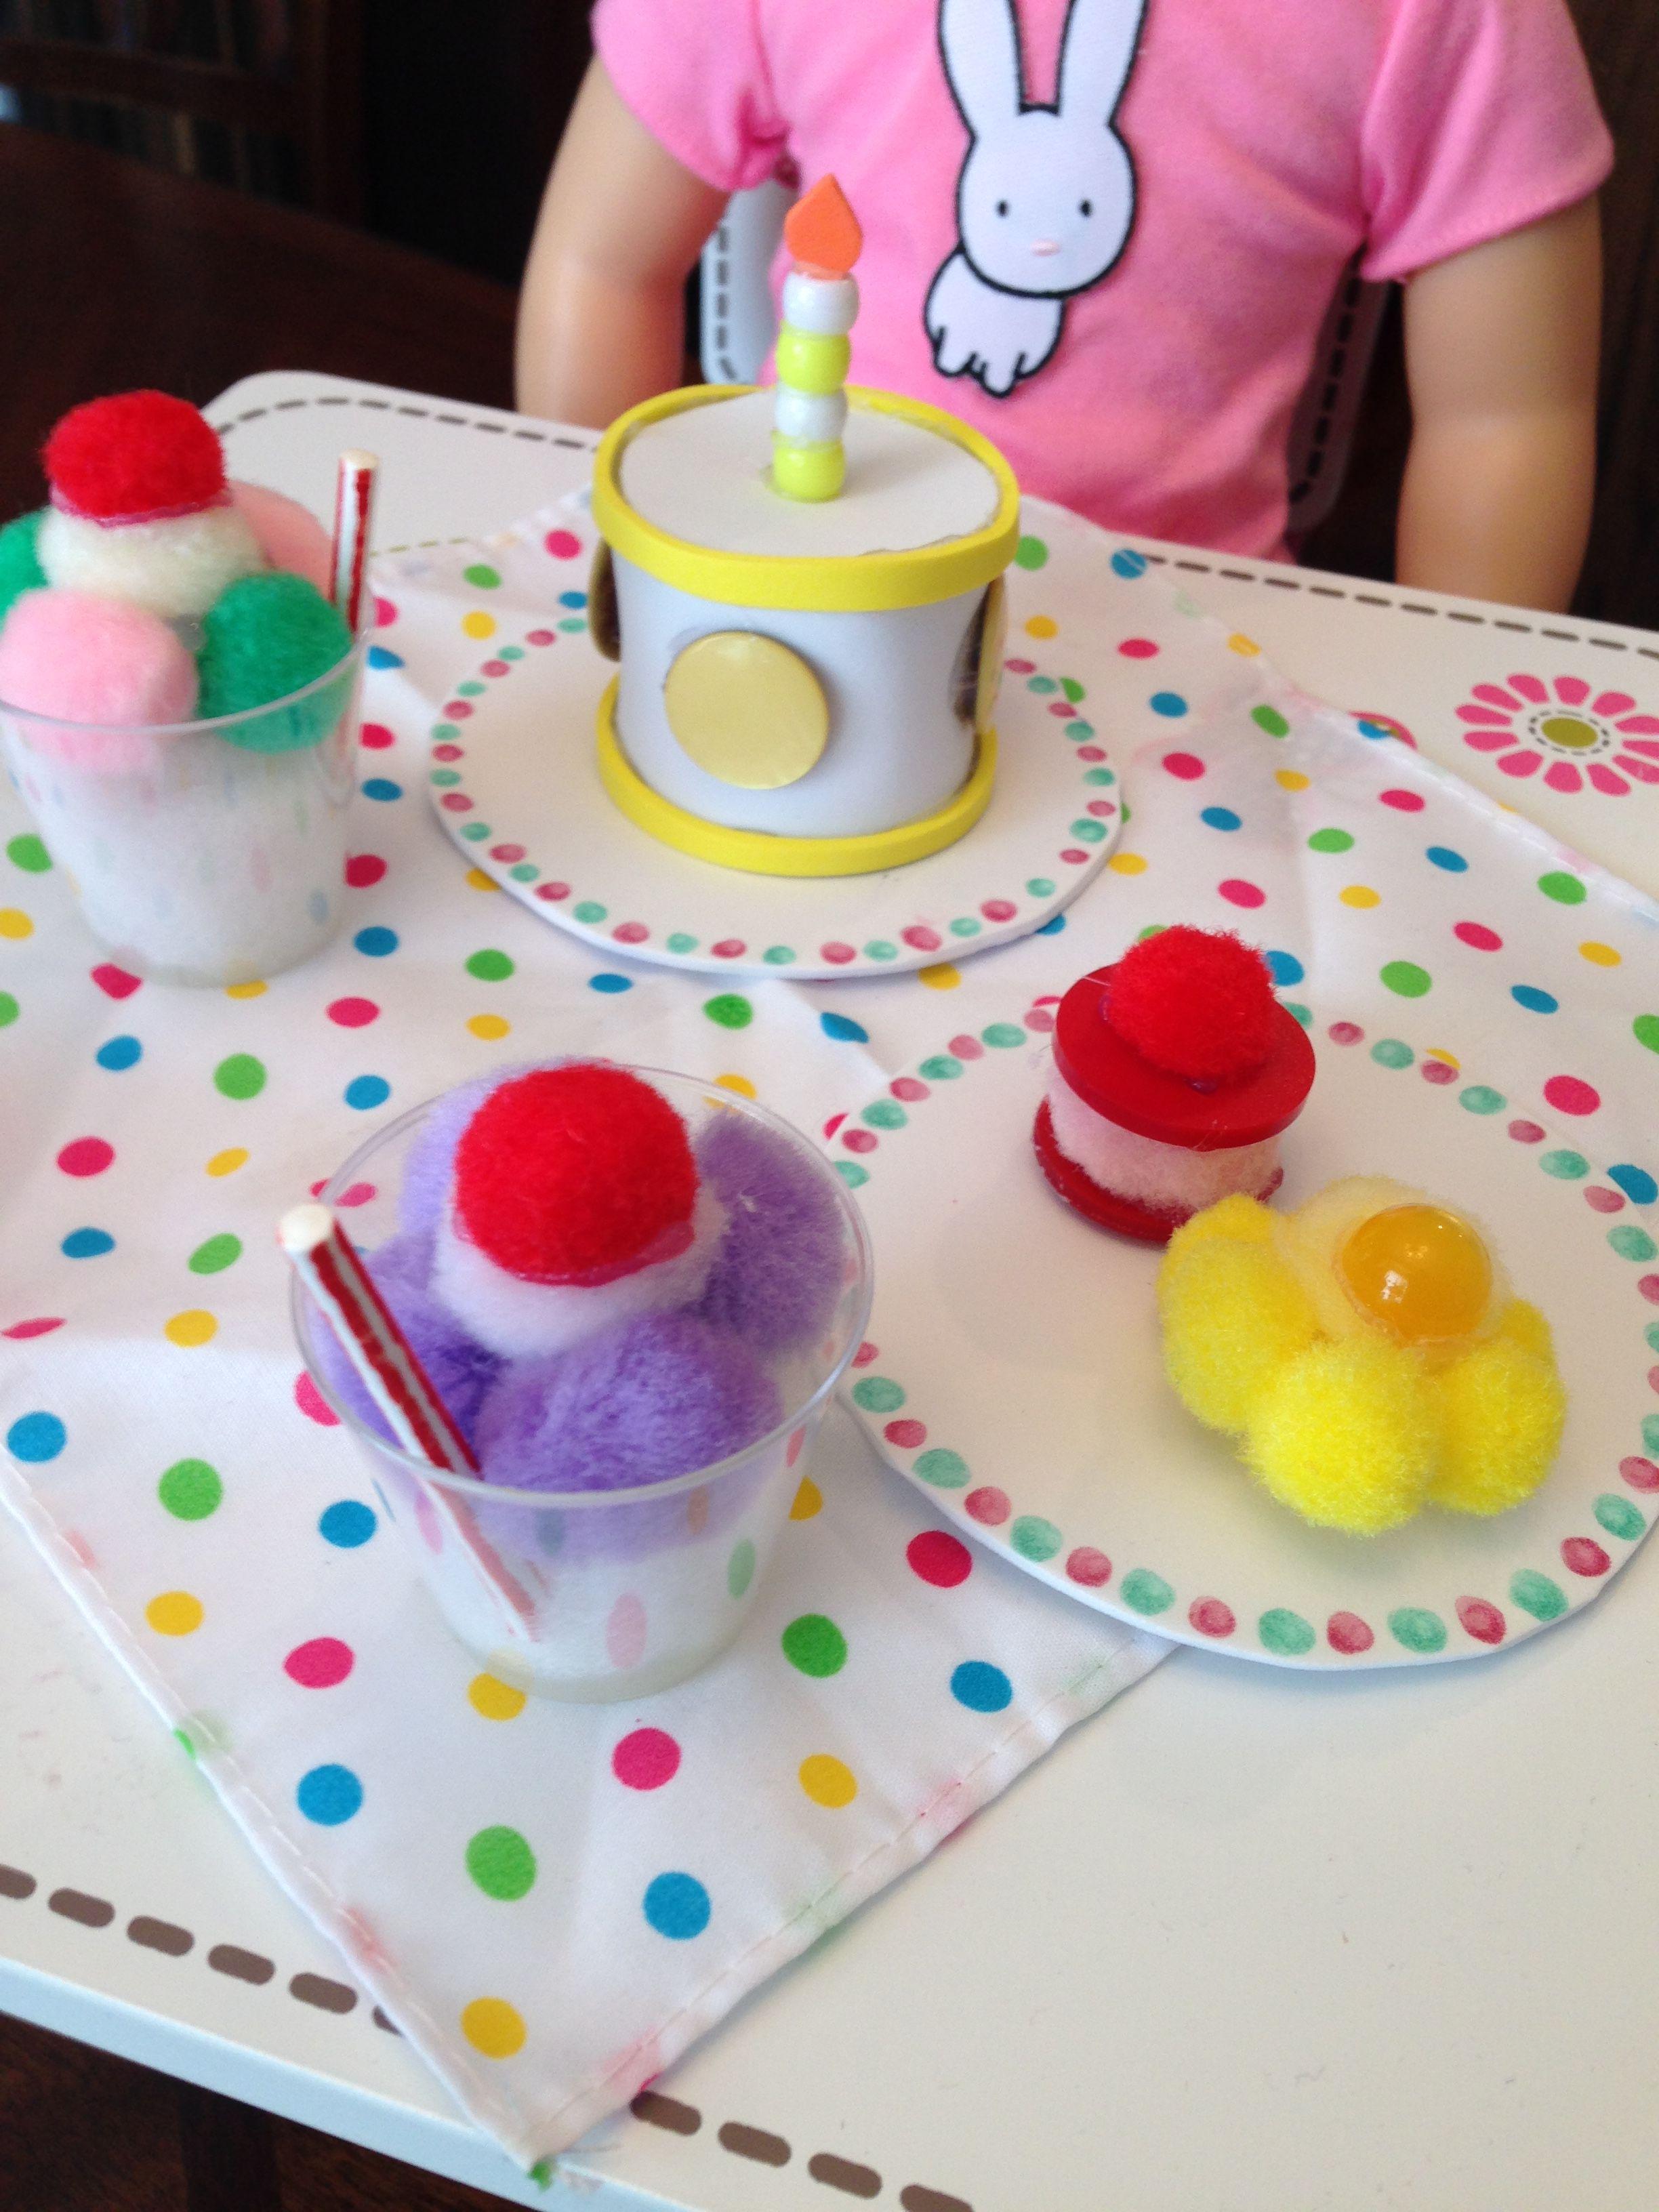 american girl doll food crafts